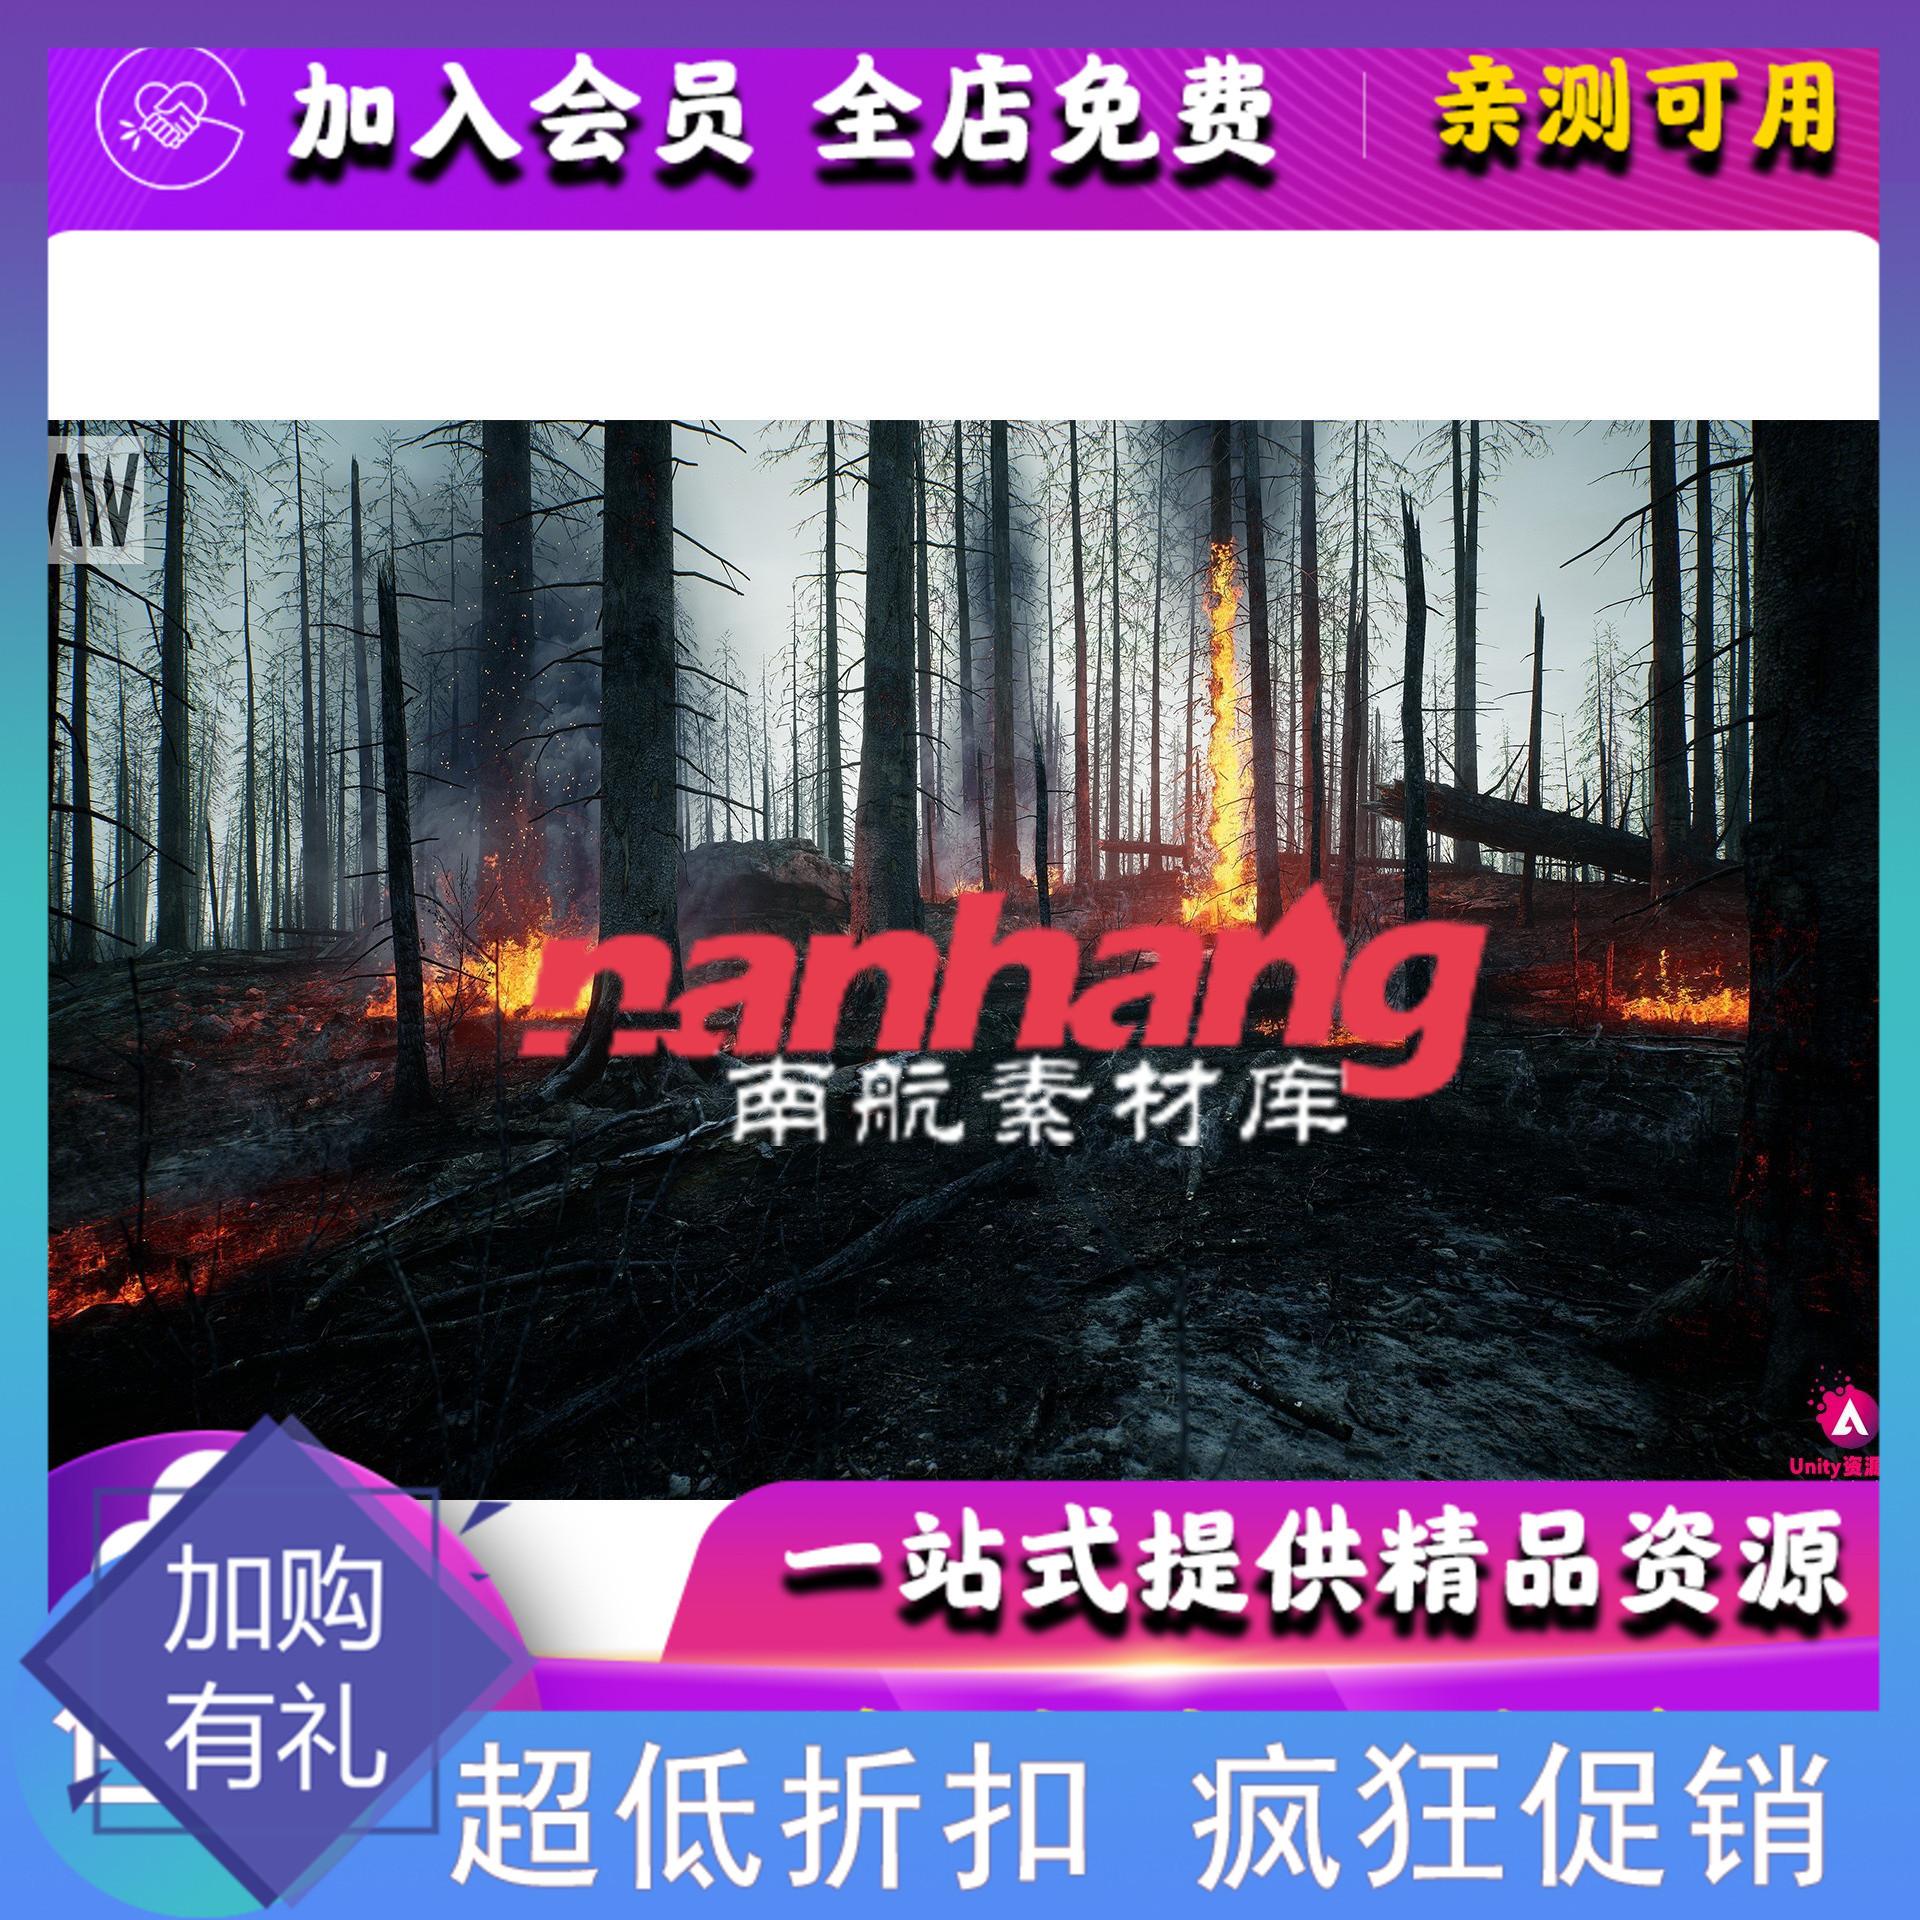 UE4虚幻4 Burned Dead Forest Biome写实烧毁破败森林树林场景